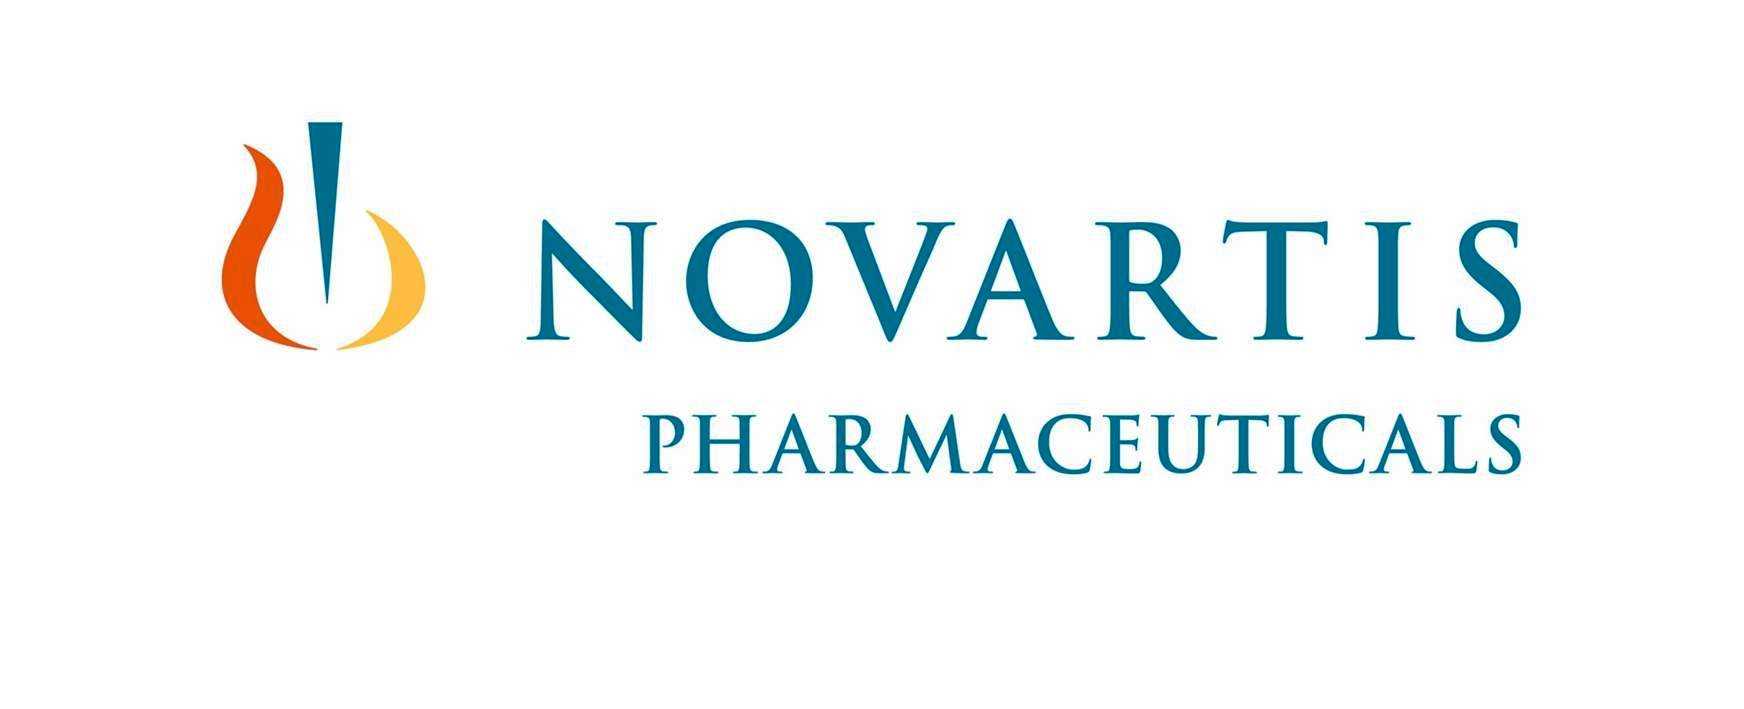 Novartis-LOGO-WITH-CORRECT-WHITE-SPACE-large.jpg